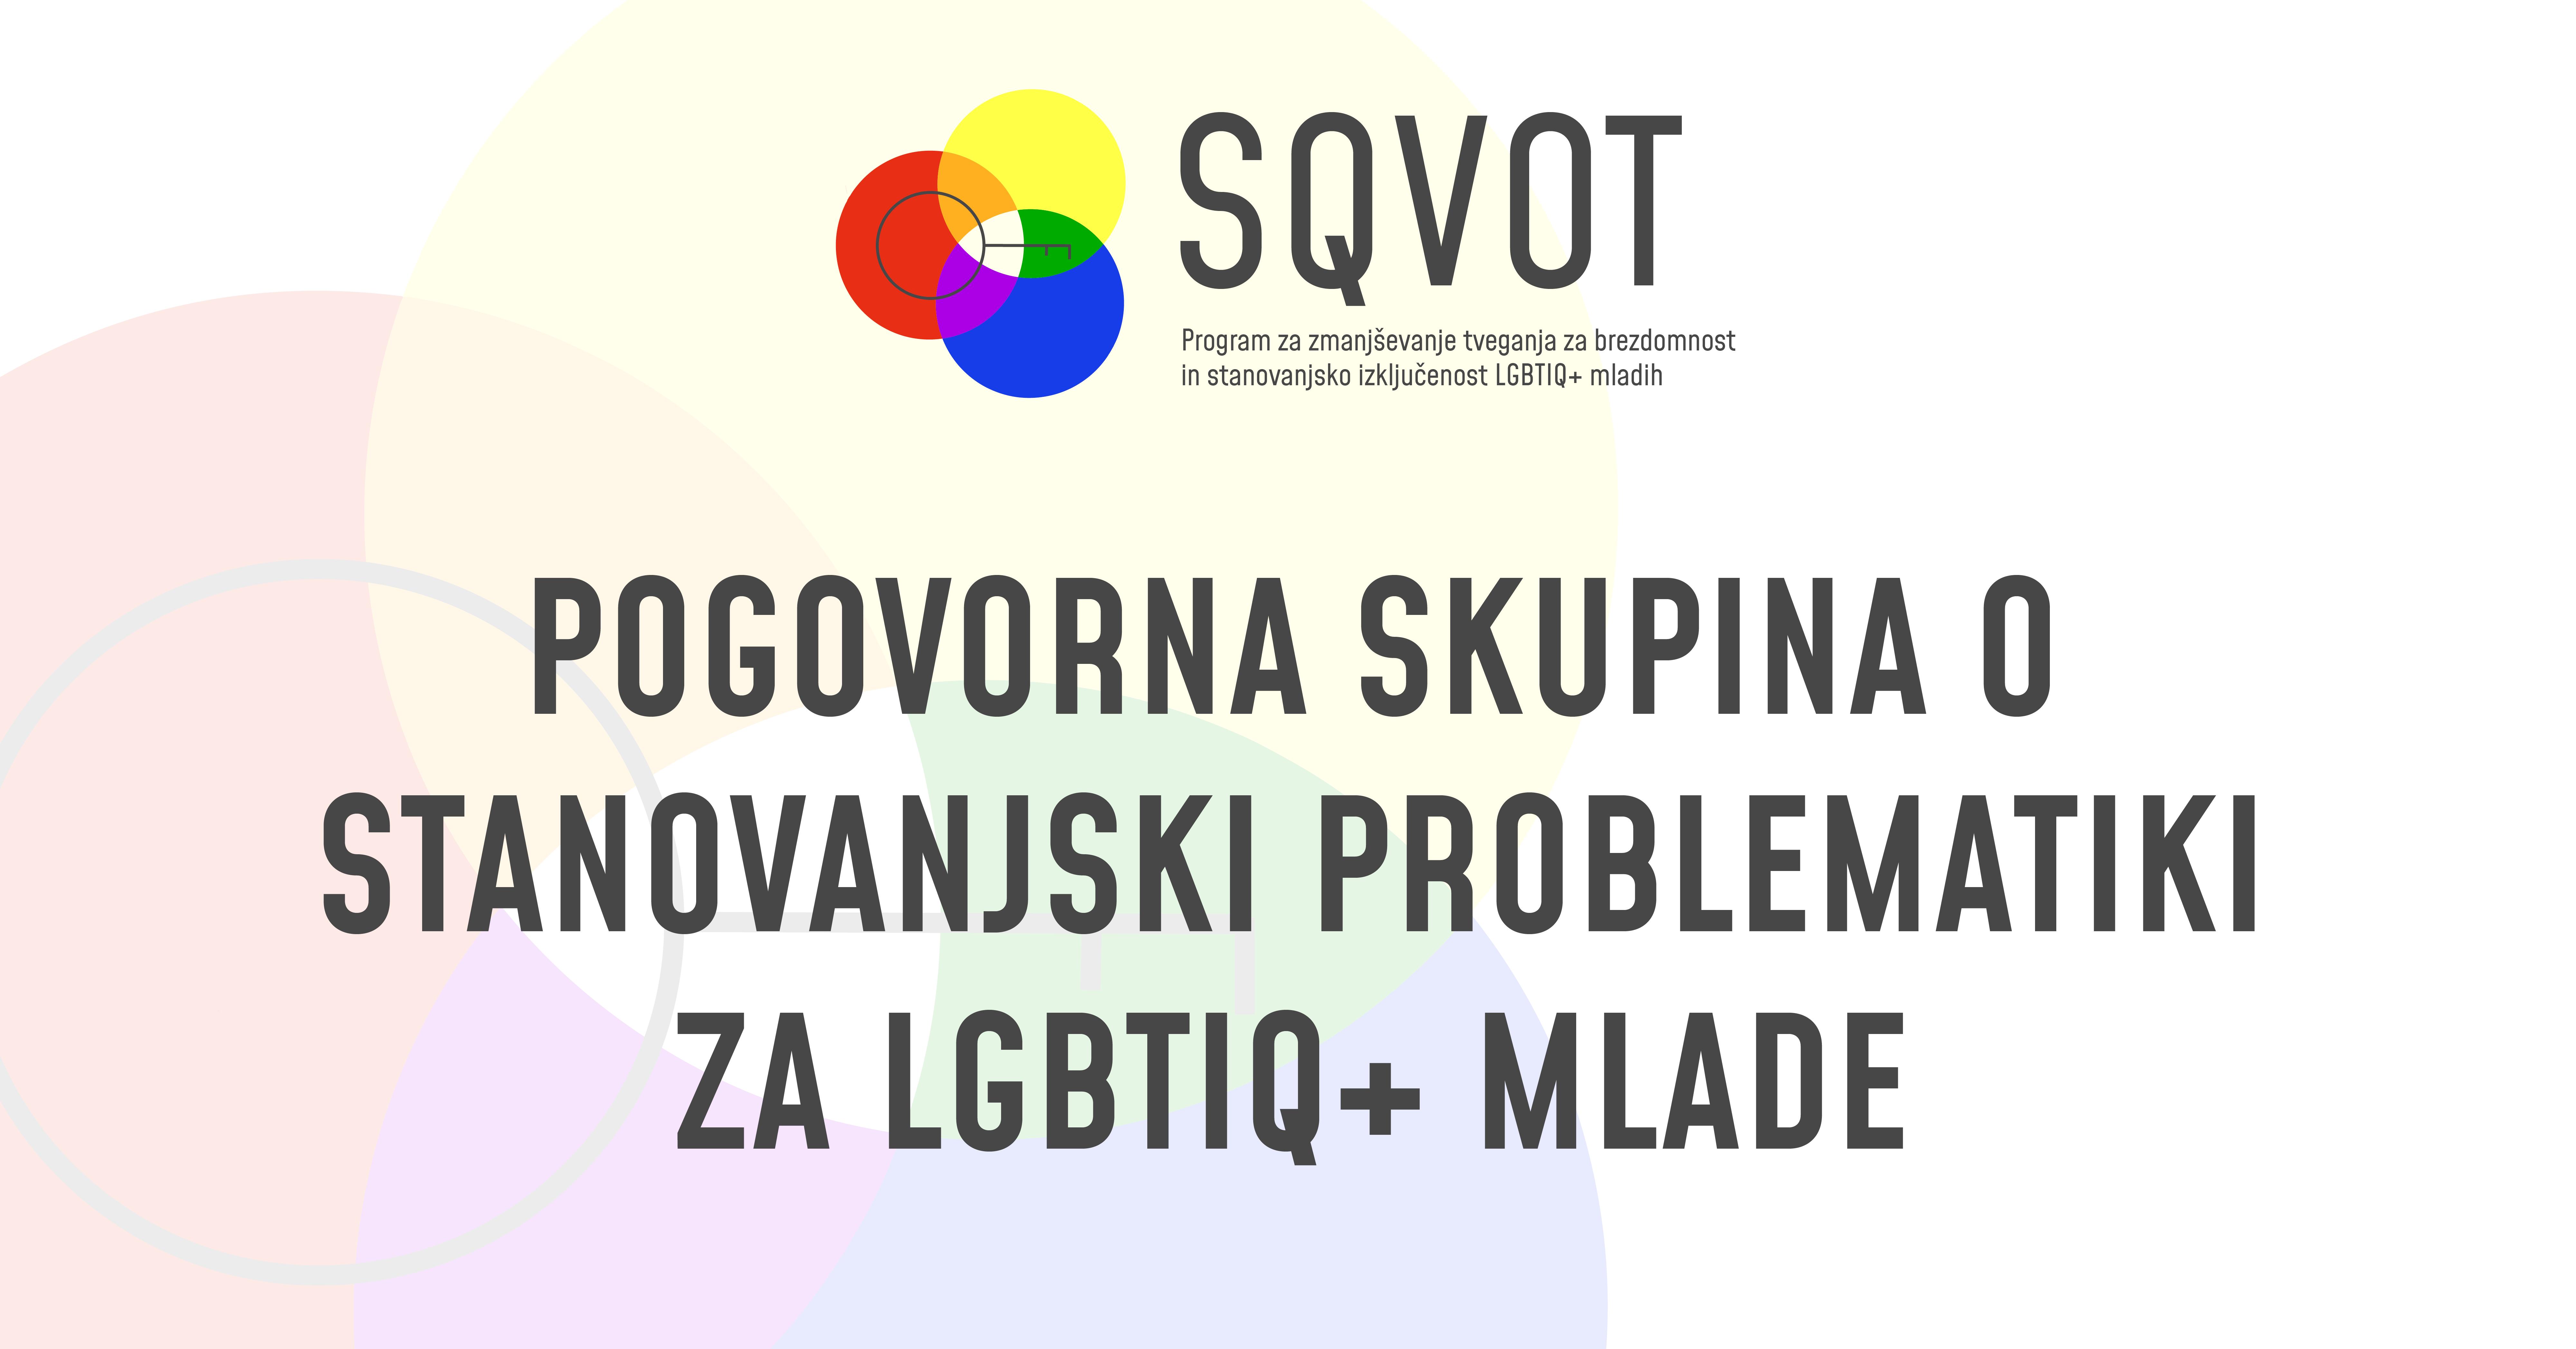 Pogovorna skupina o stanovanjski problematiki za LGBTIQ+ mlade